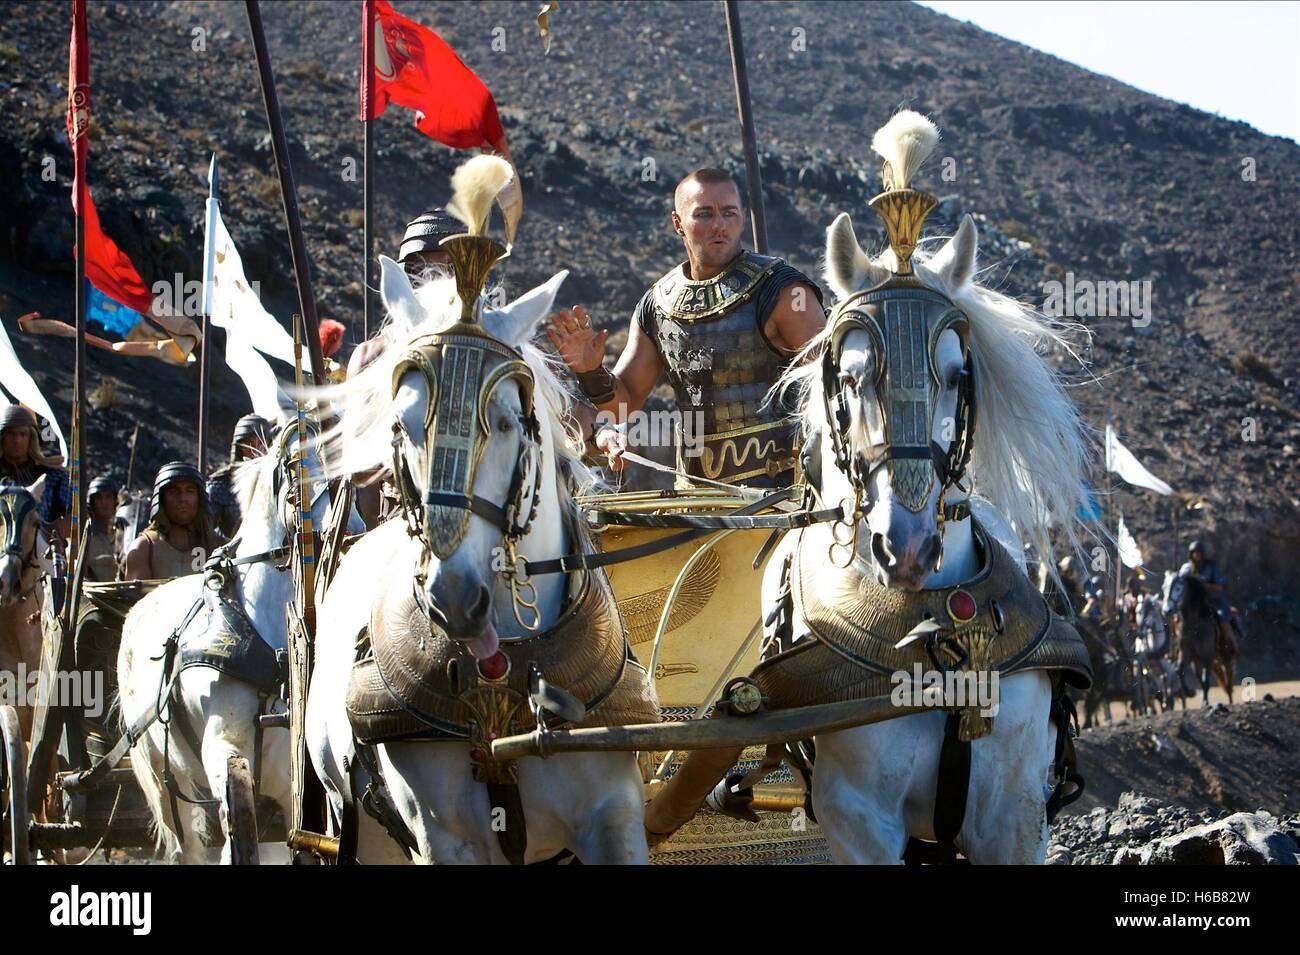 JOEL EDGERTON EXODUS: GODS AND KINGS (2014) - Stock Image